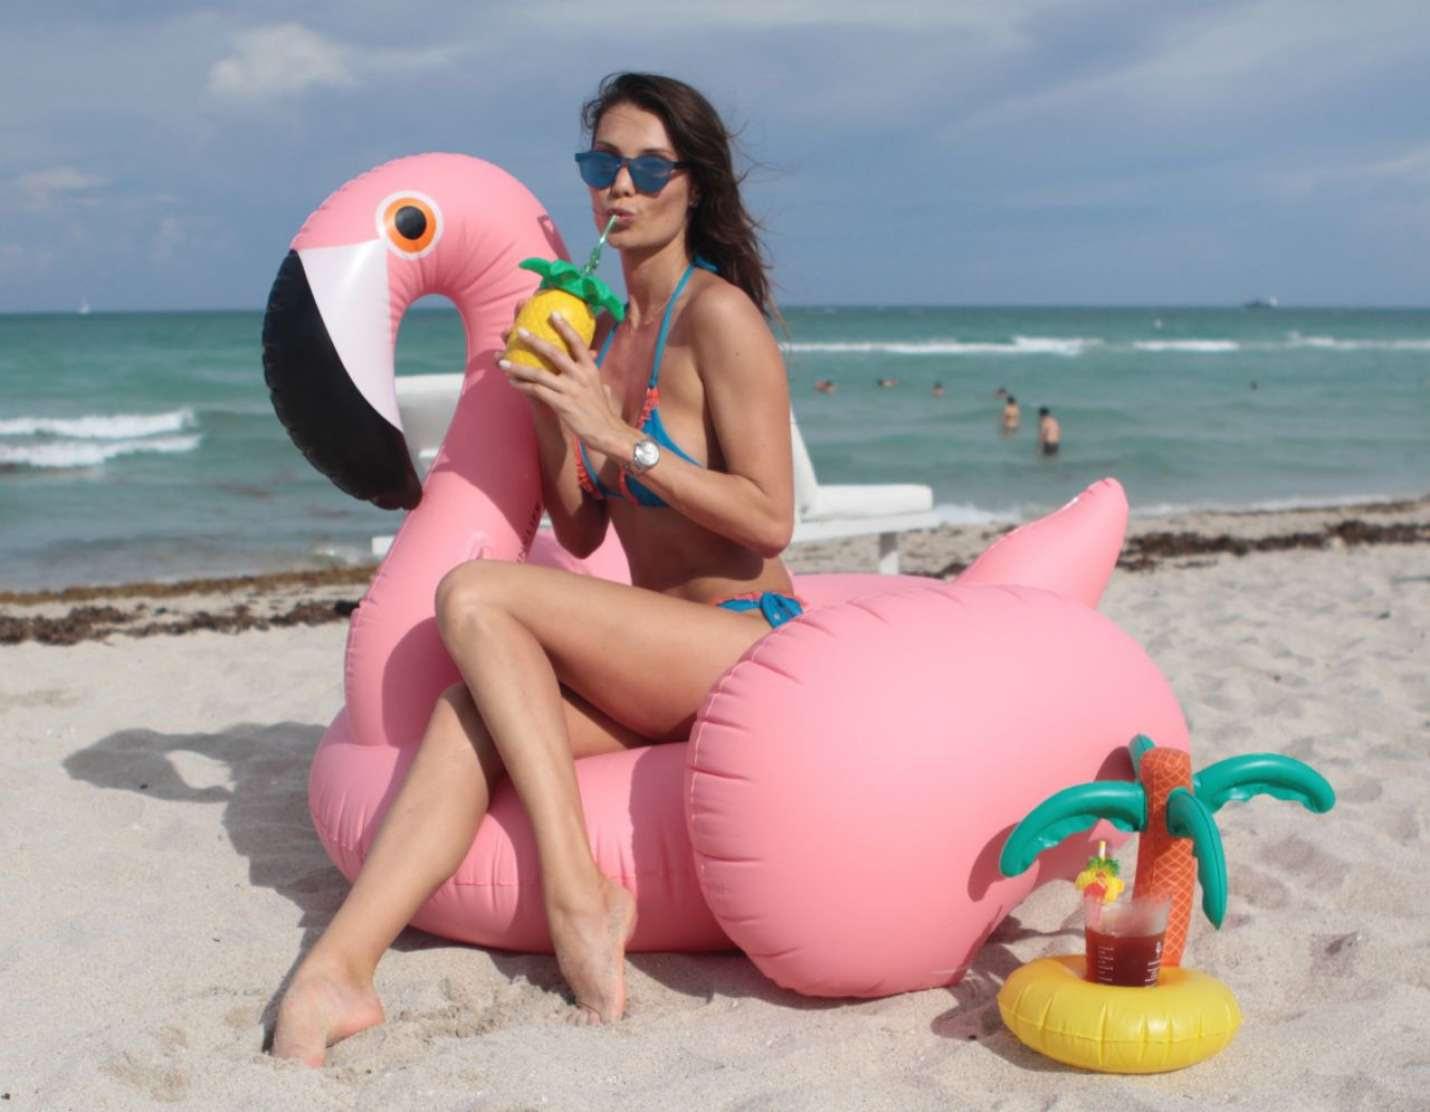 north miami beach hindu single women North miami beach's best 100% free online dating site meet loads of available single women in north miami beach with mingle2's north miami beach dating services.